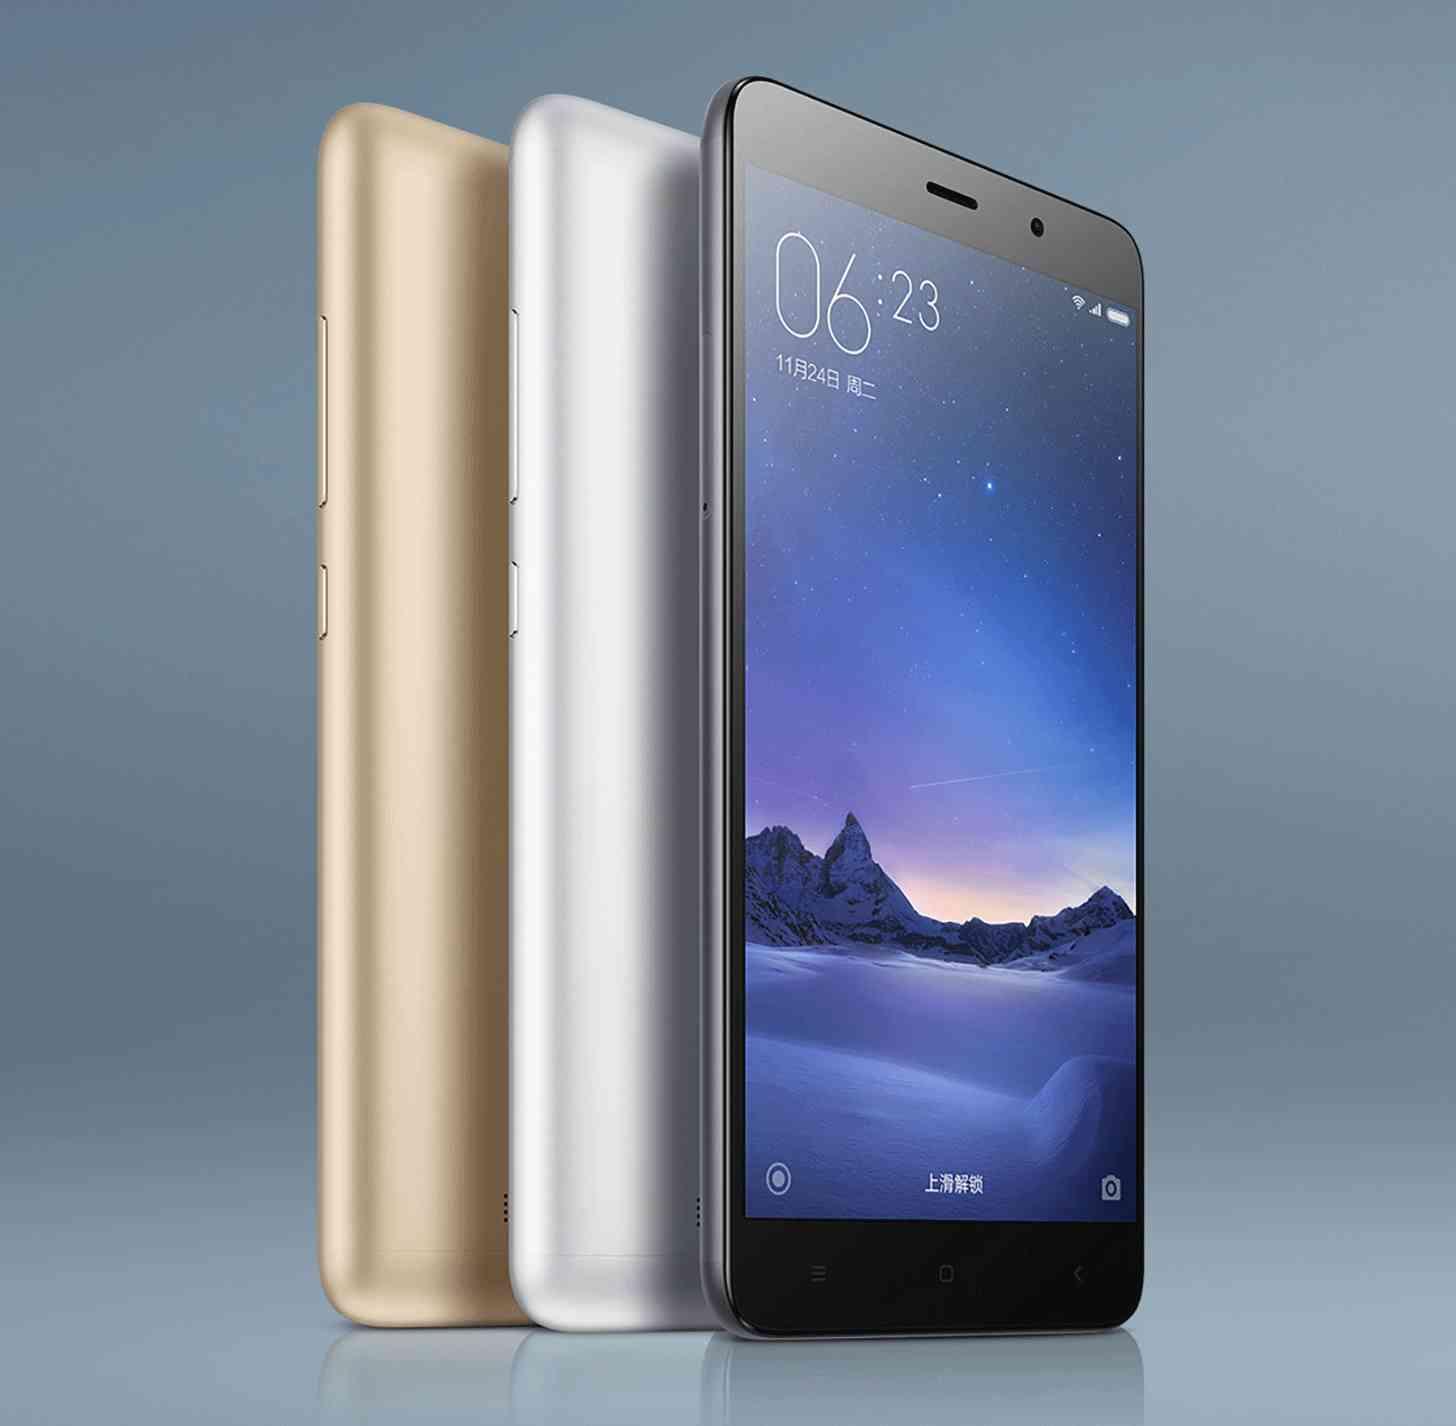 Xiaomi Redmi Note 3 Snapdragon 650 large